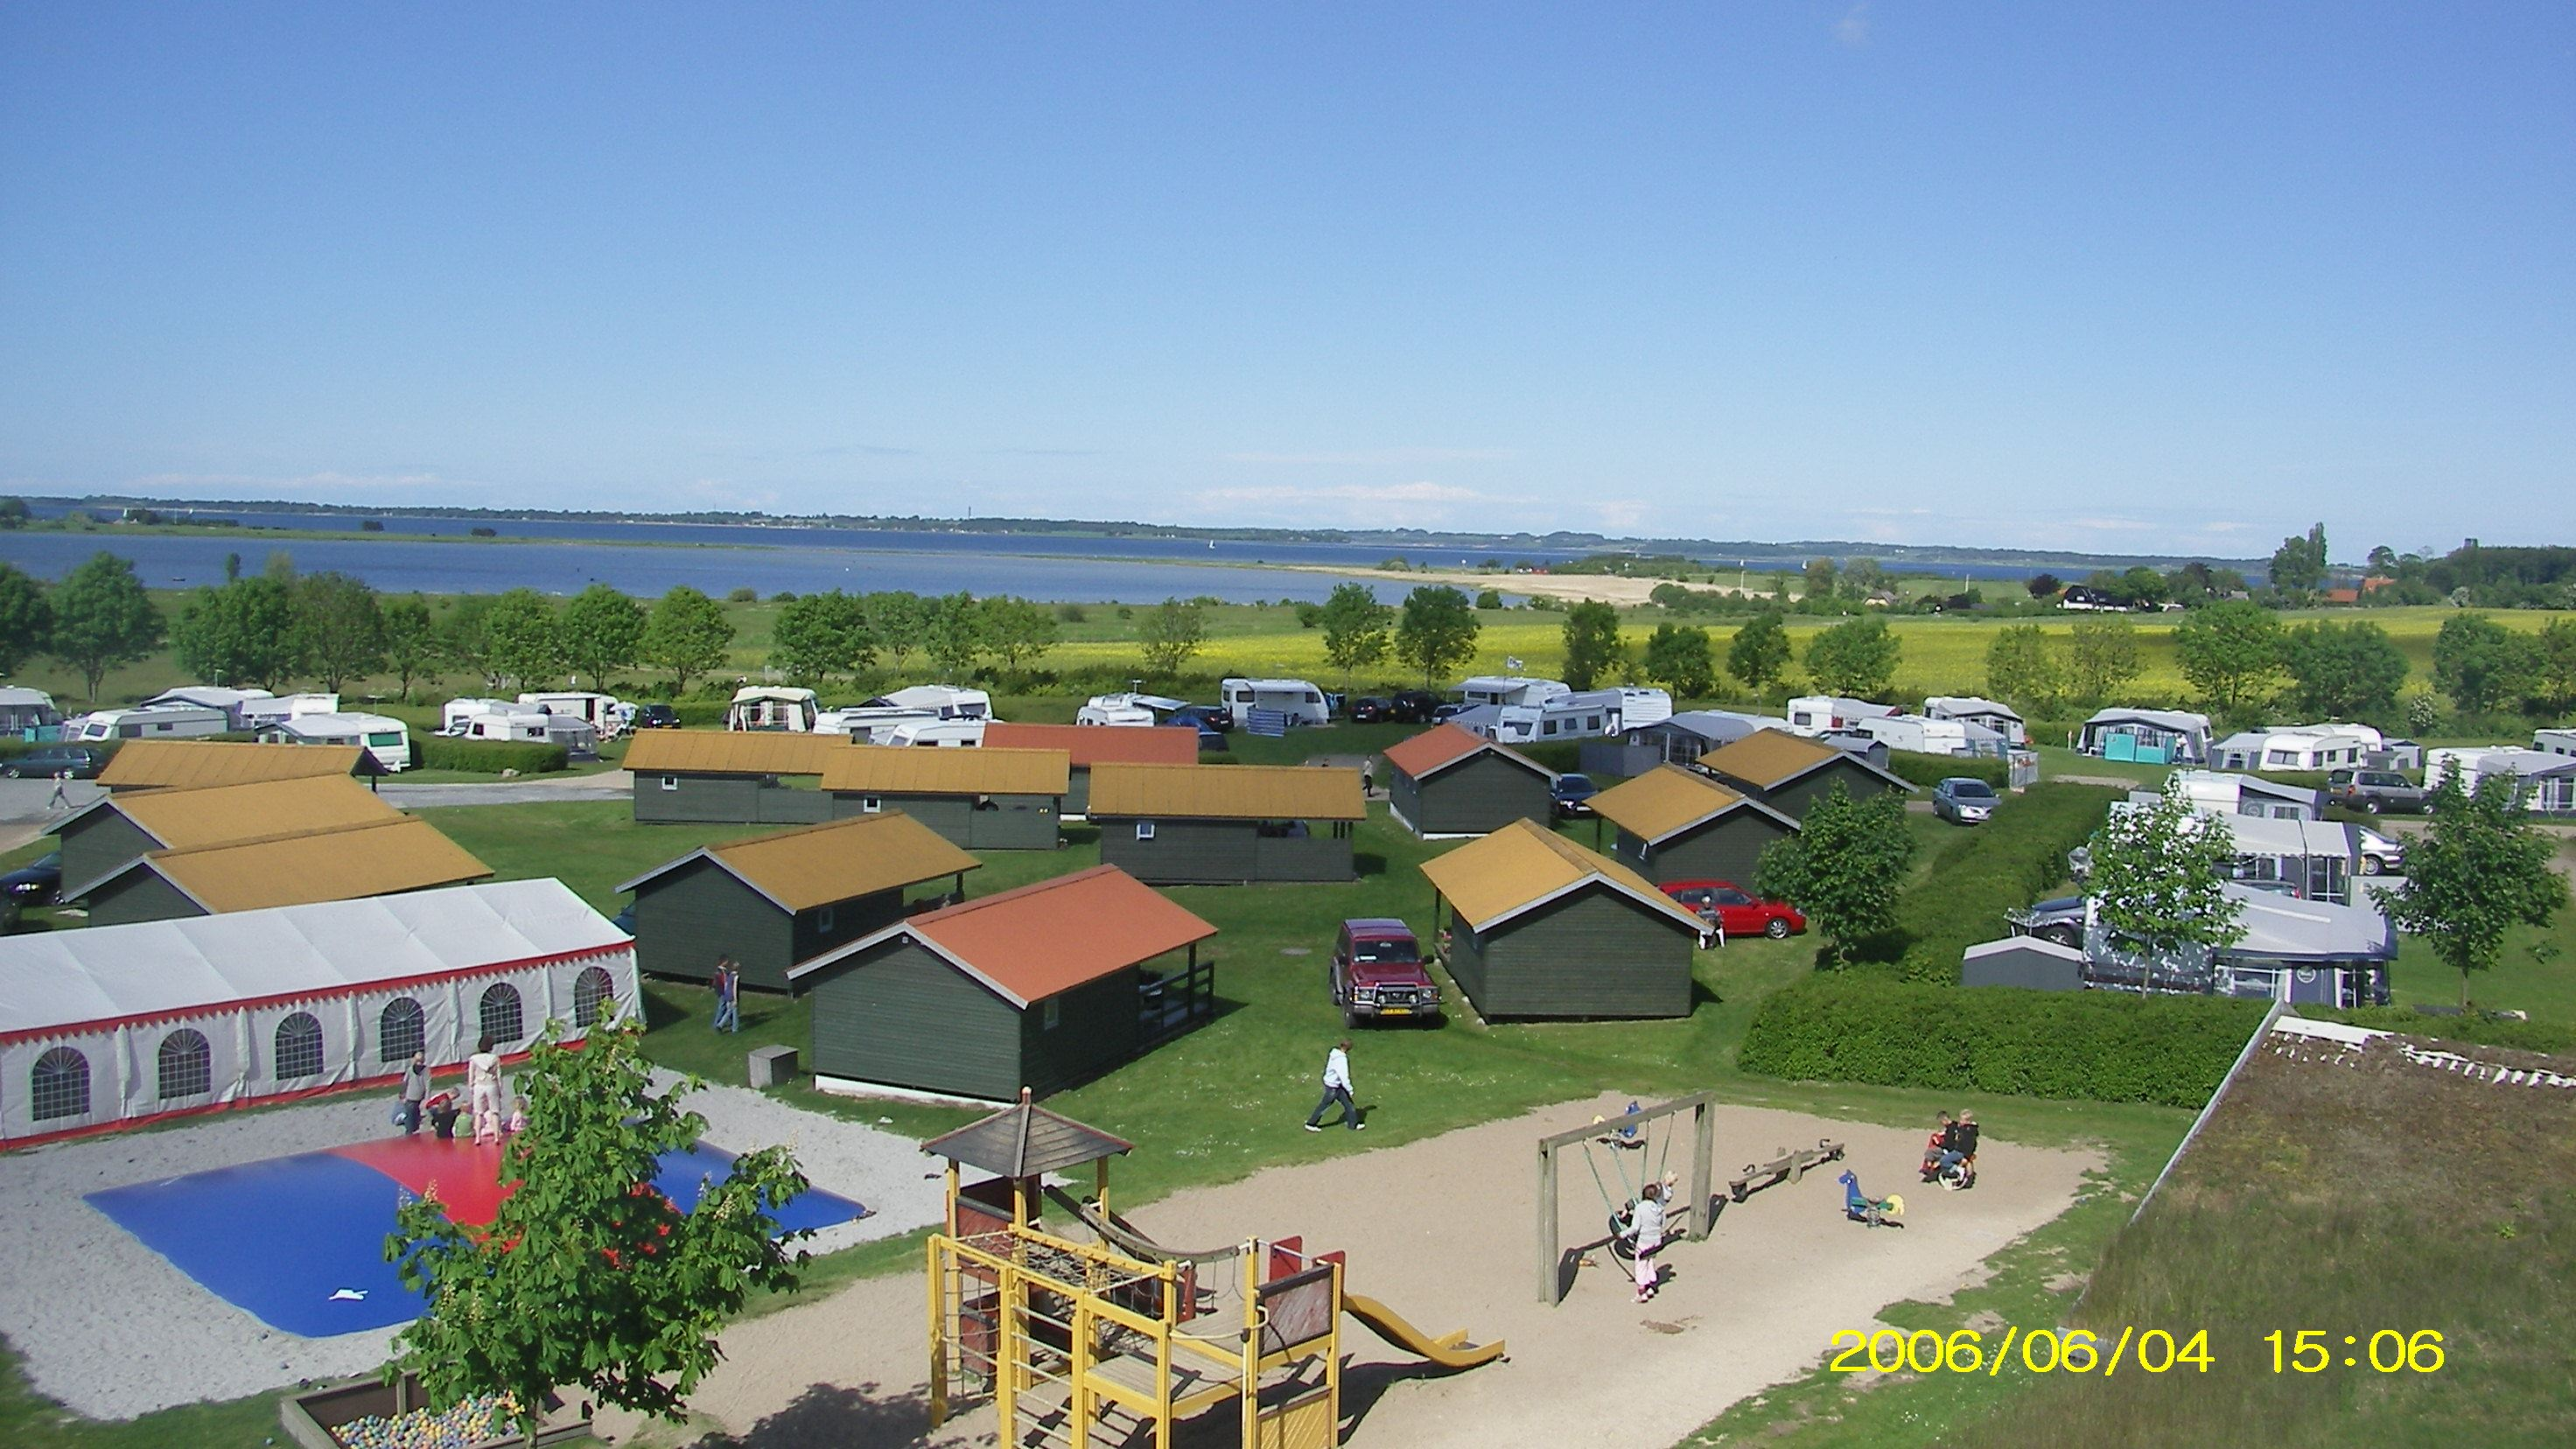 Holbæk Fjord Camping & Wellness